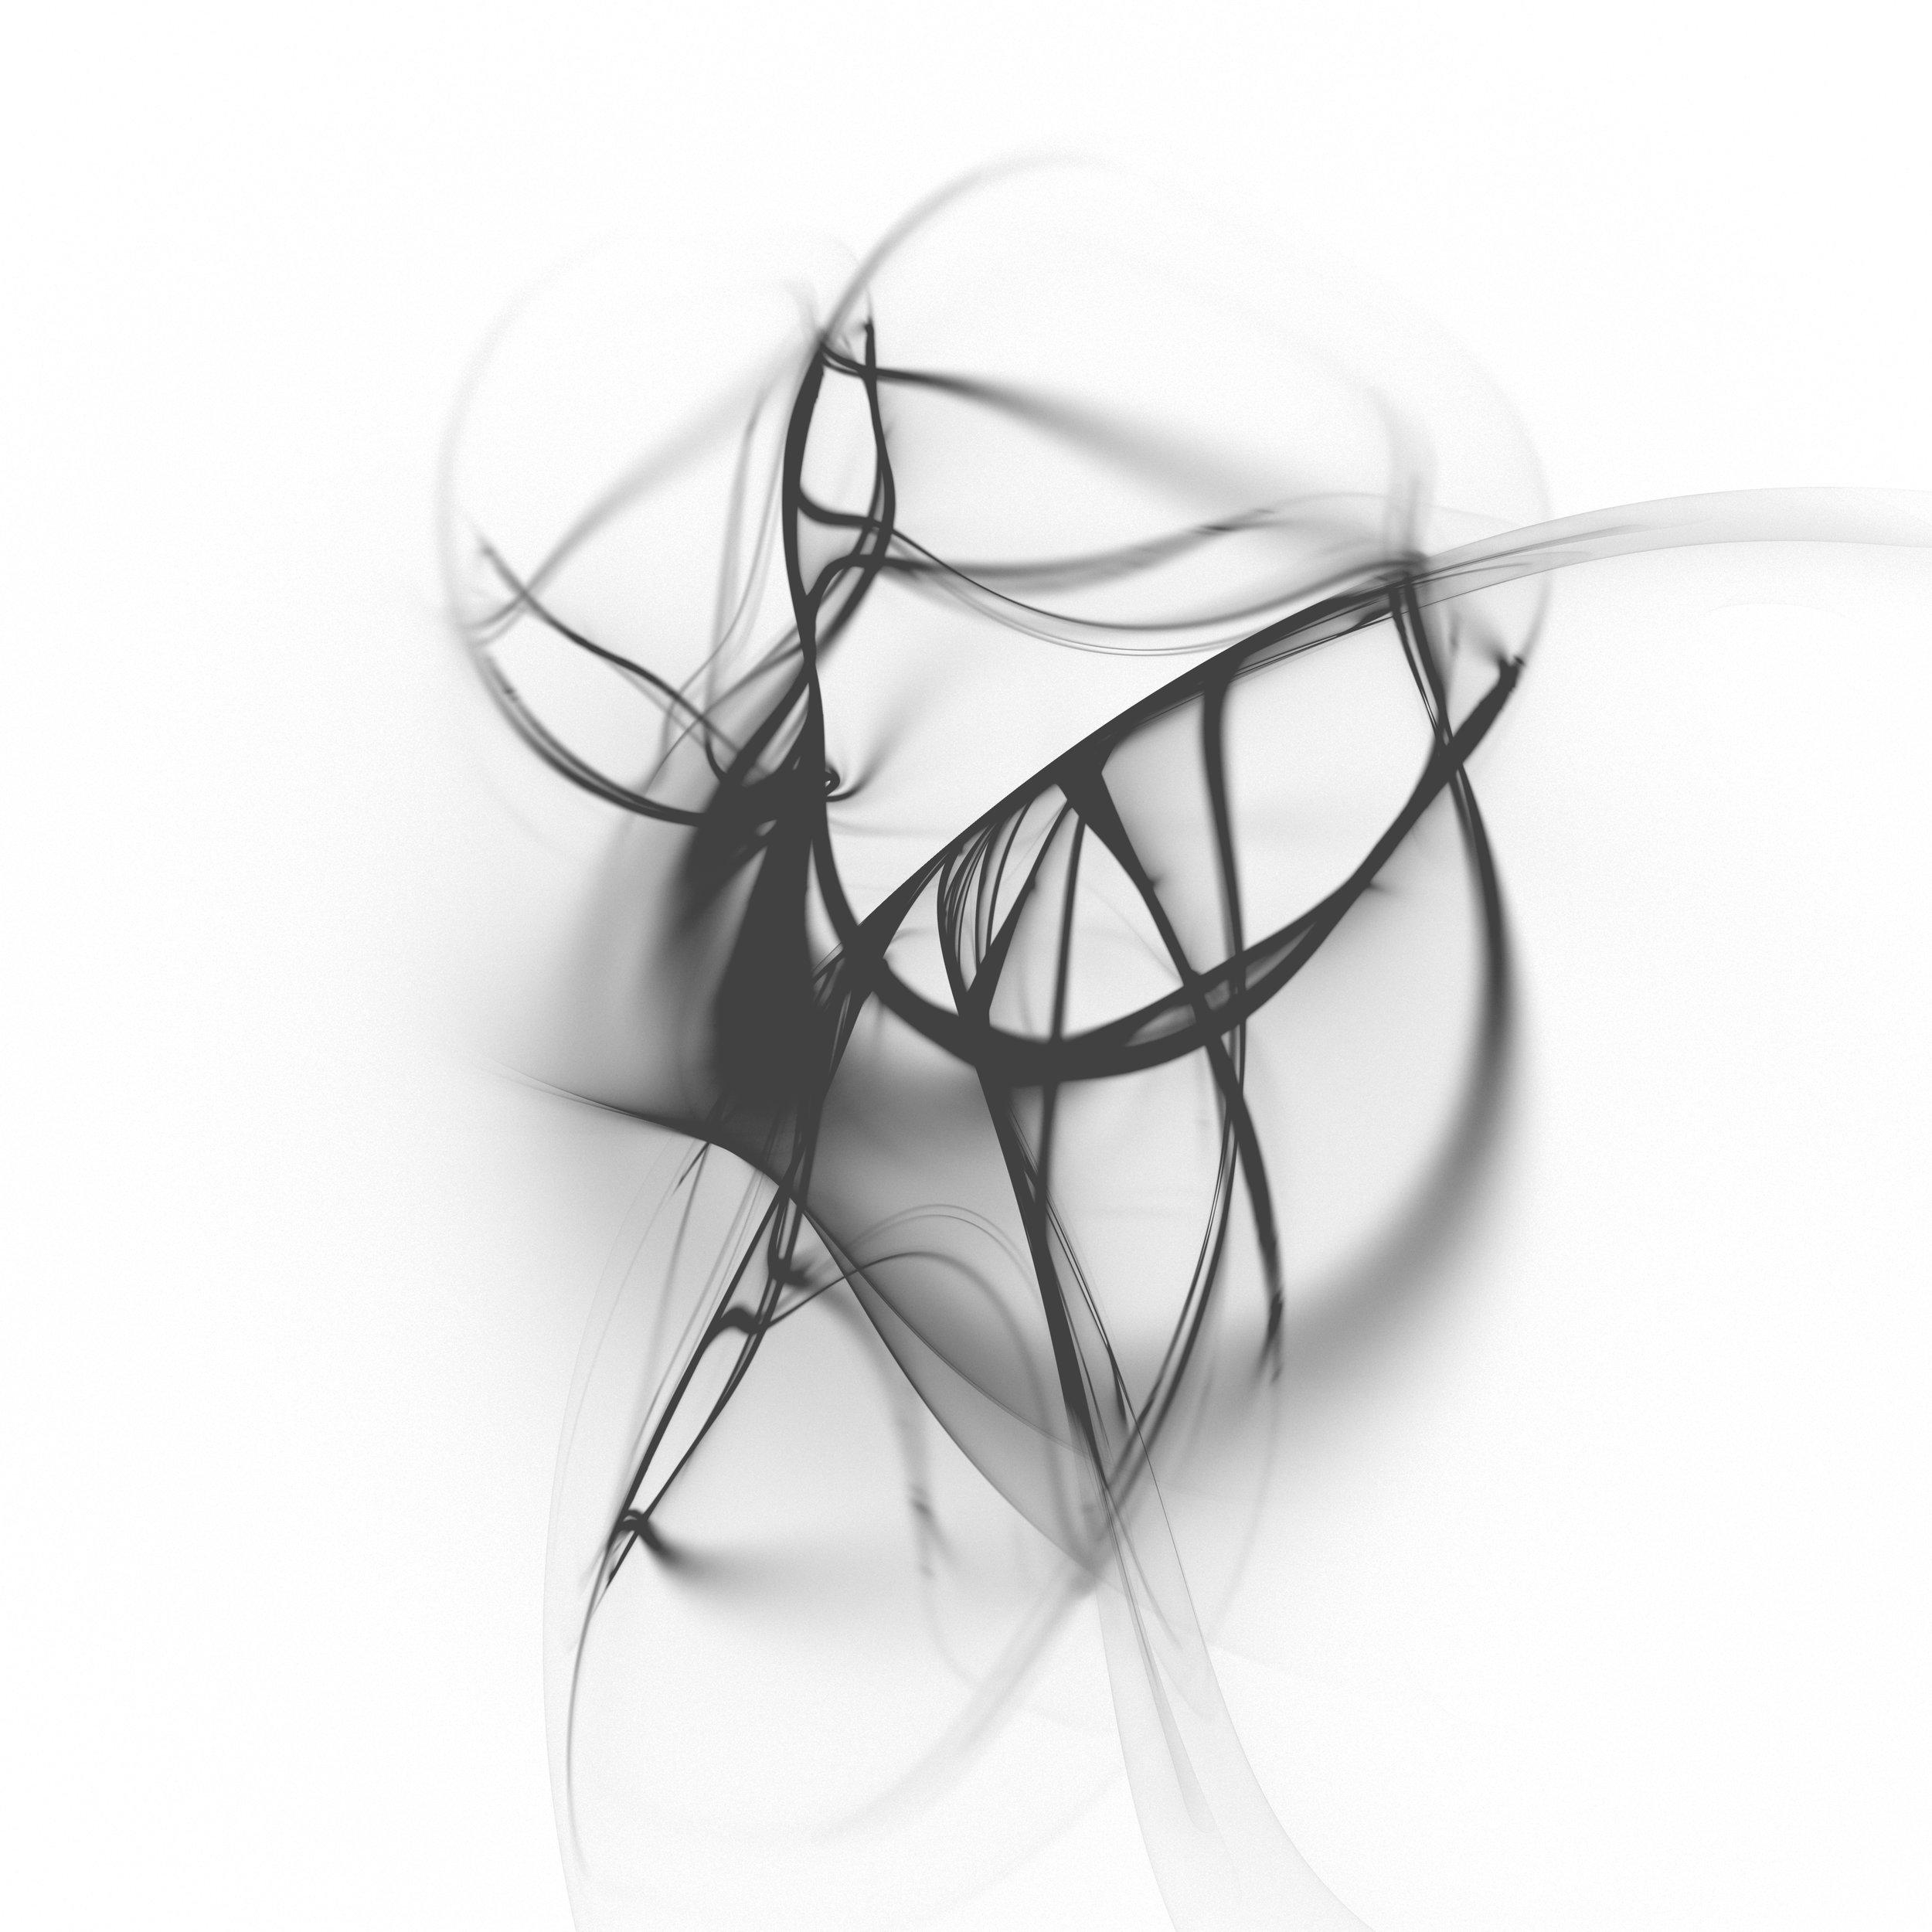 Thorns_4800px_WEB.jpg